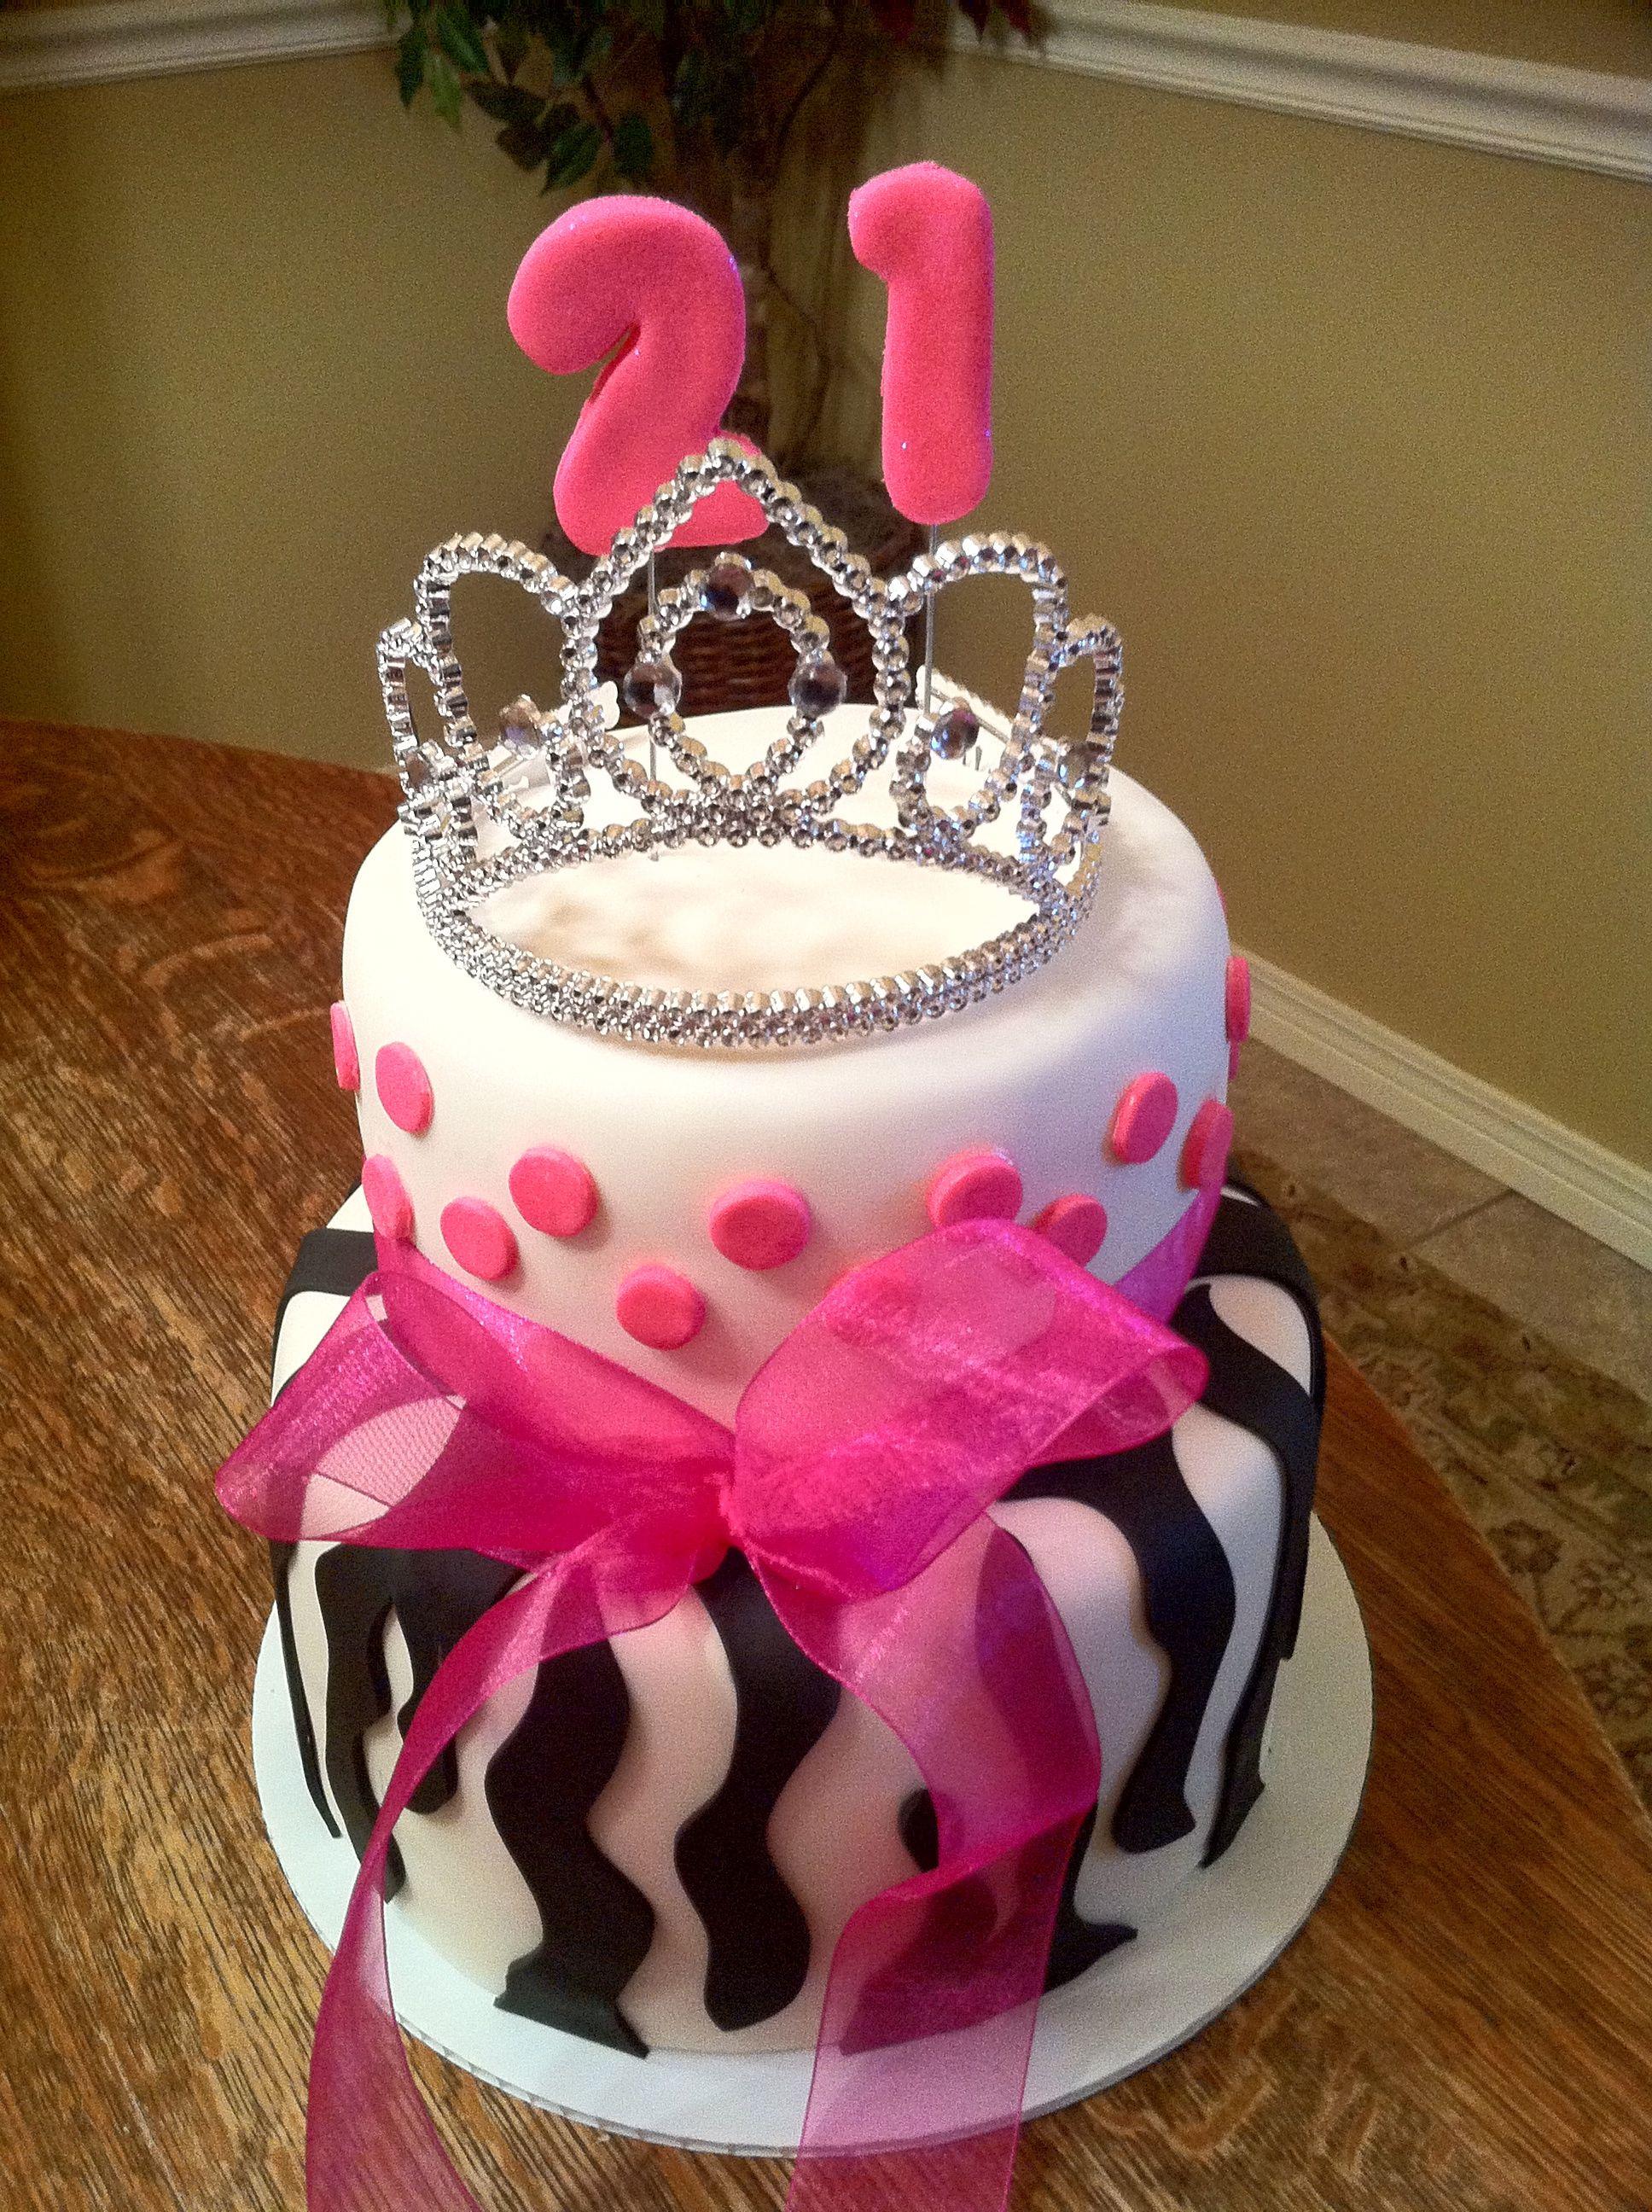 21st Birthday Cake It Was Made For Me Zebra Print